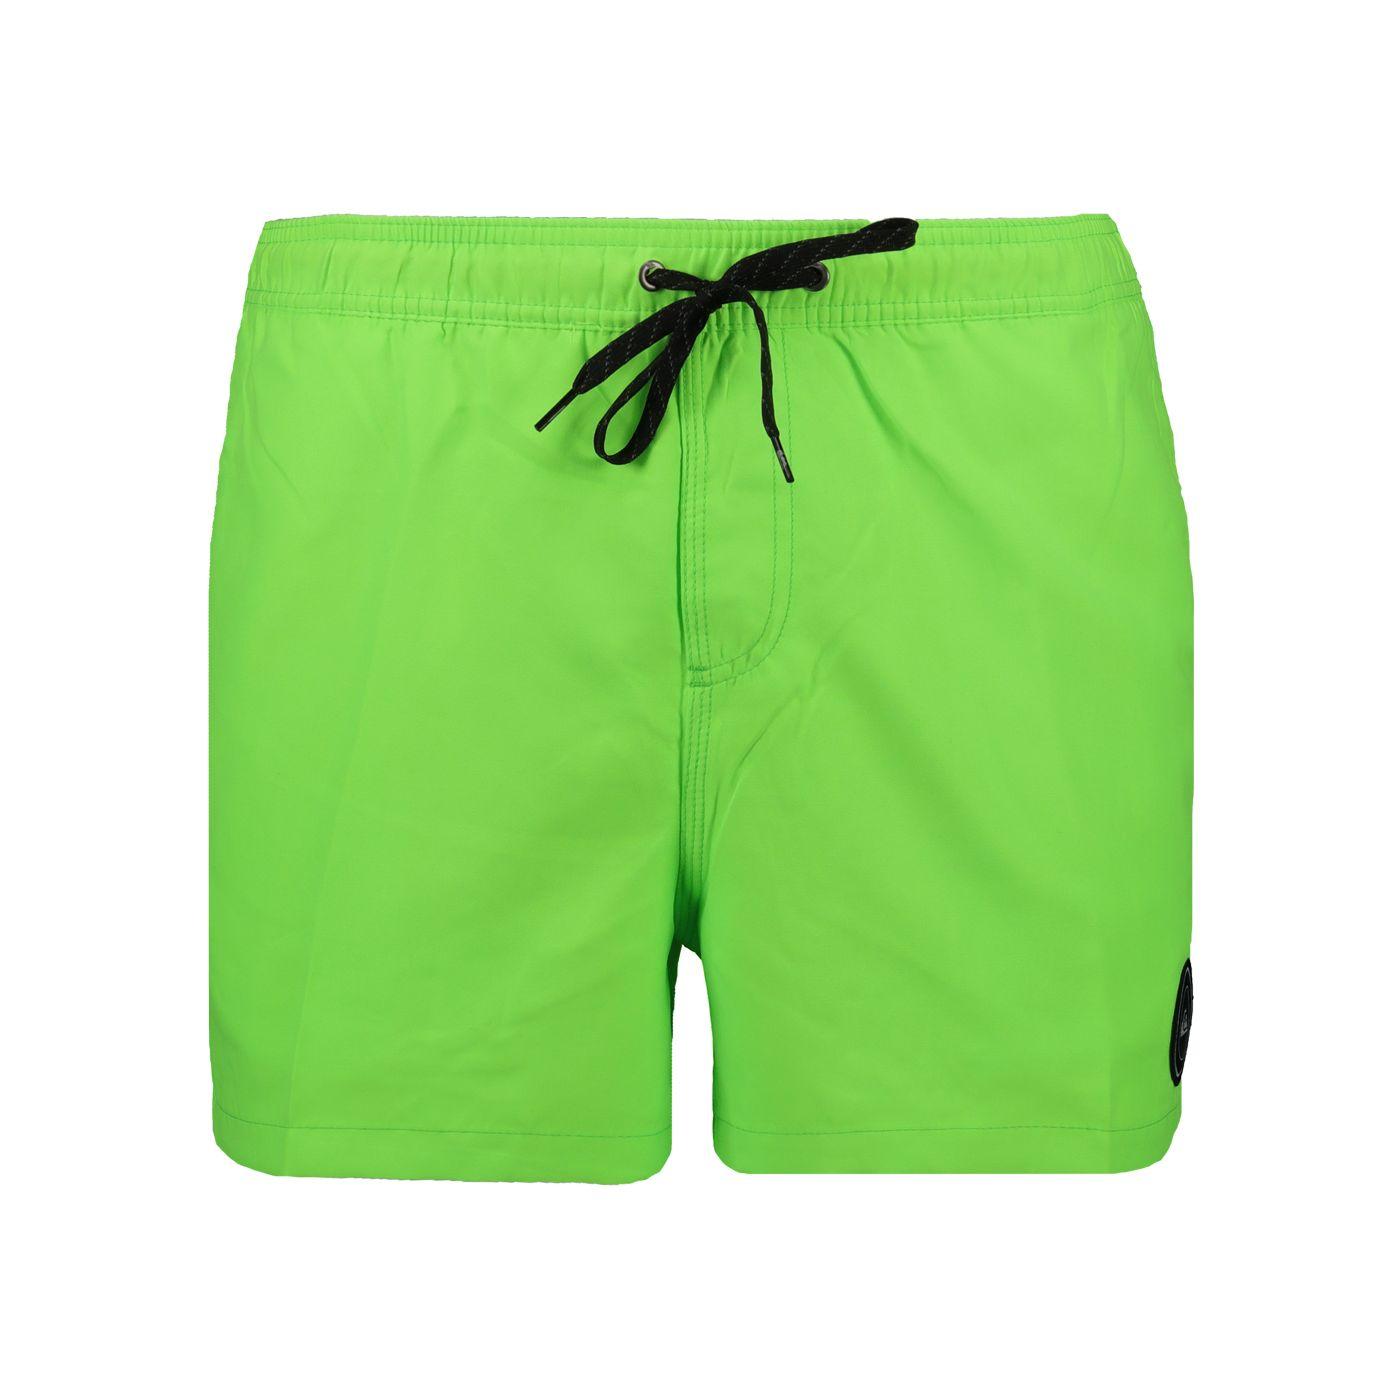 Men's Swim Shorts QUIKSILVER EVERYDAYVL15 M JAMV